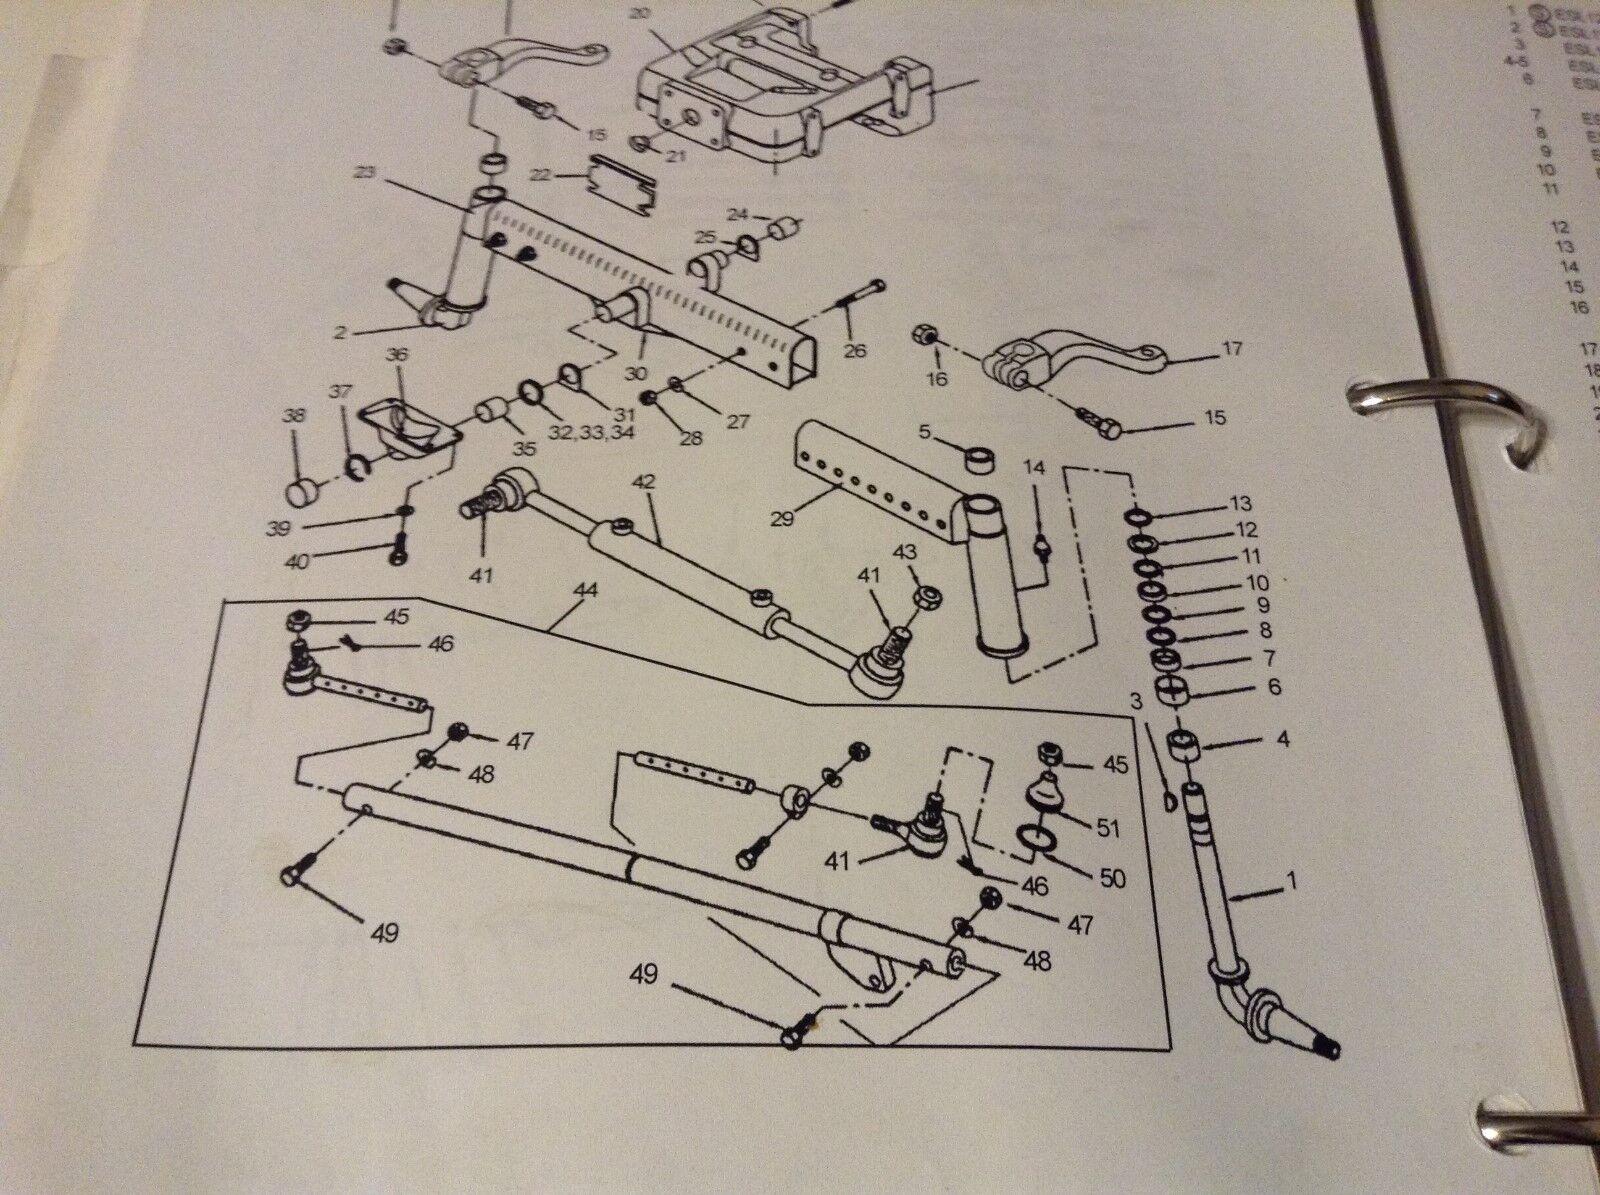 535 ford alternator wiring diagram lock up controller wiring Ford 555 Wiring Diagram  Ford 555E Wiring Diagram Ford 345D Wiring Diagram Ford 555 Backhoe Wiring Harness